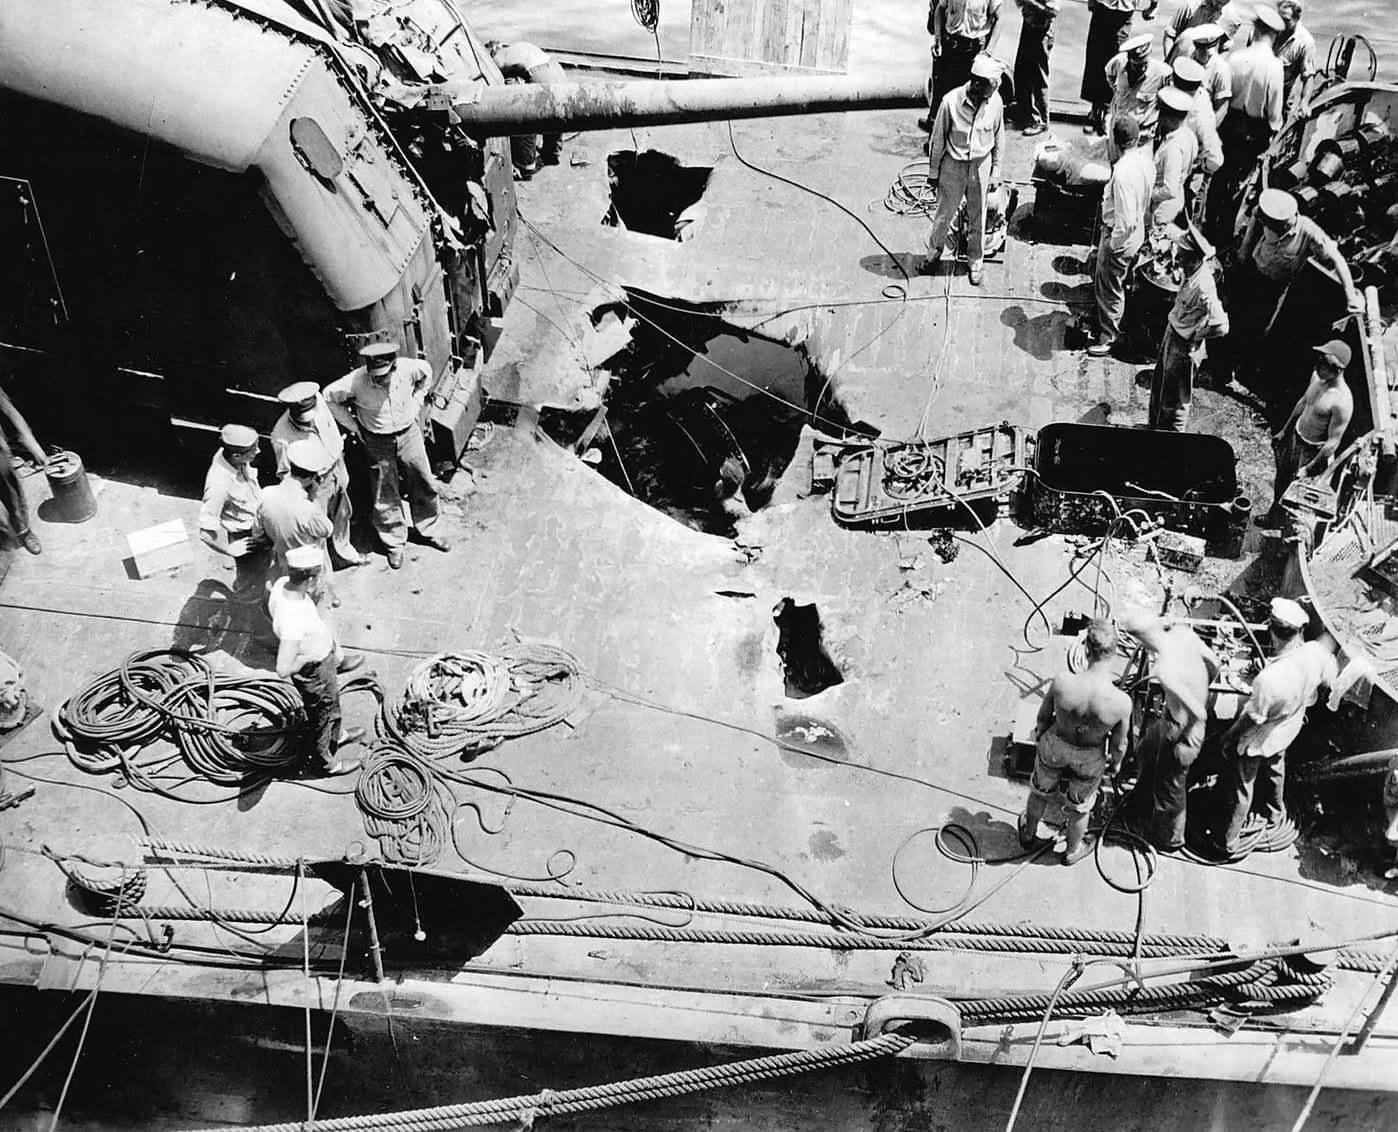 Destroyer USS Halsey Powell DD-686 After Kamikaze Attack Off Kyushu 1945